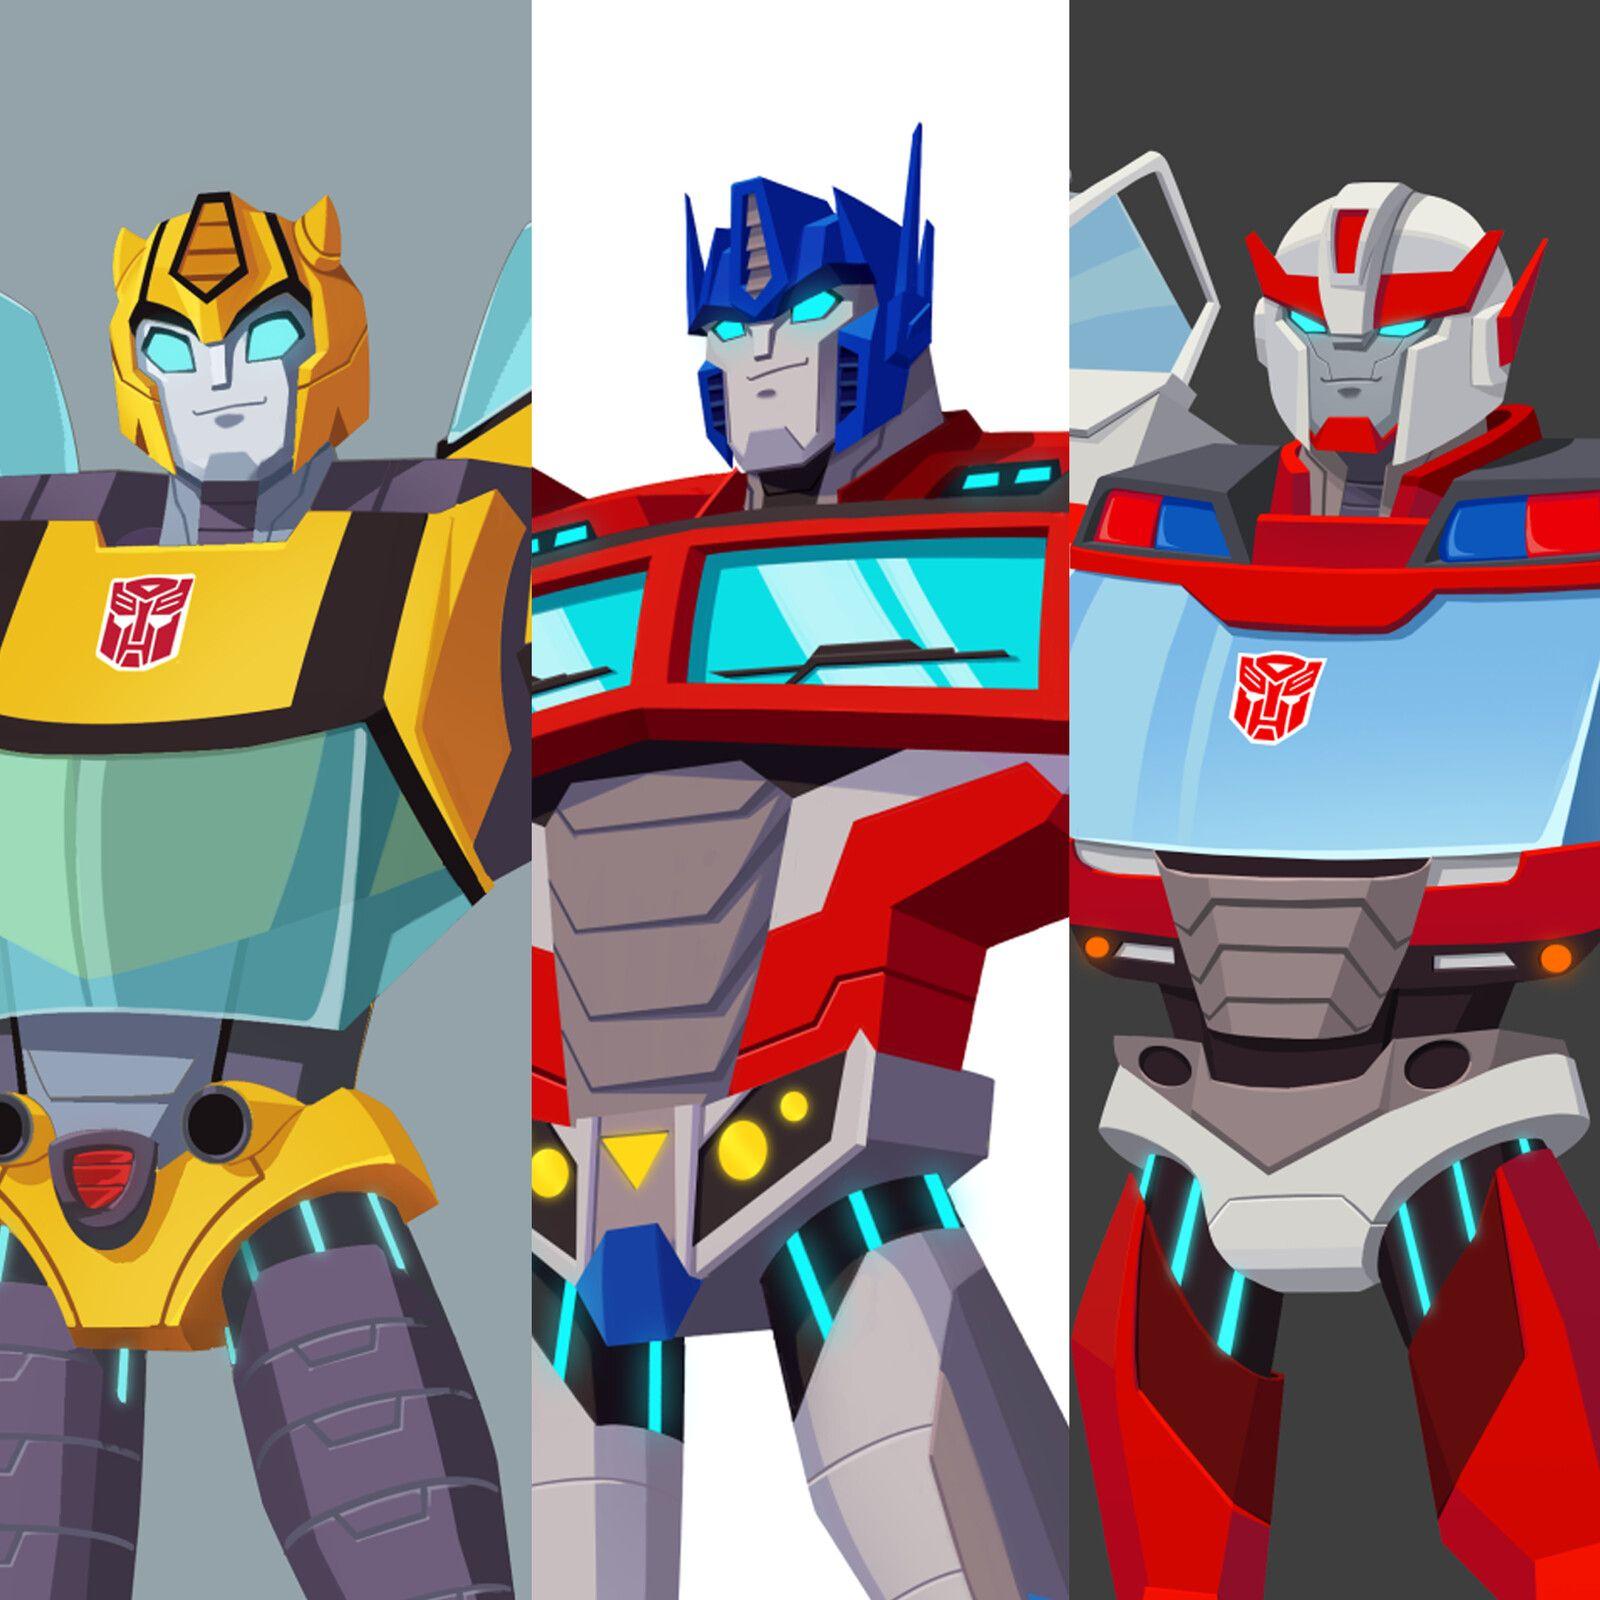 Transformers Cyberverse Season 1 Pack Leo Chiola On Artstation At Https Www Artstation Com Artwork Pmo1zo Utm Source Dlvr It Utm Medium Twitter อะน เมะ